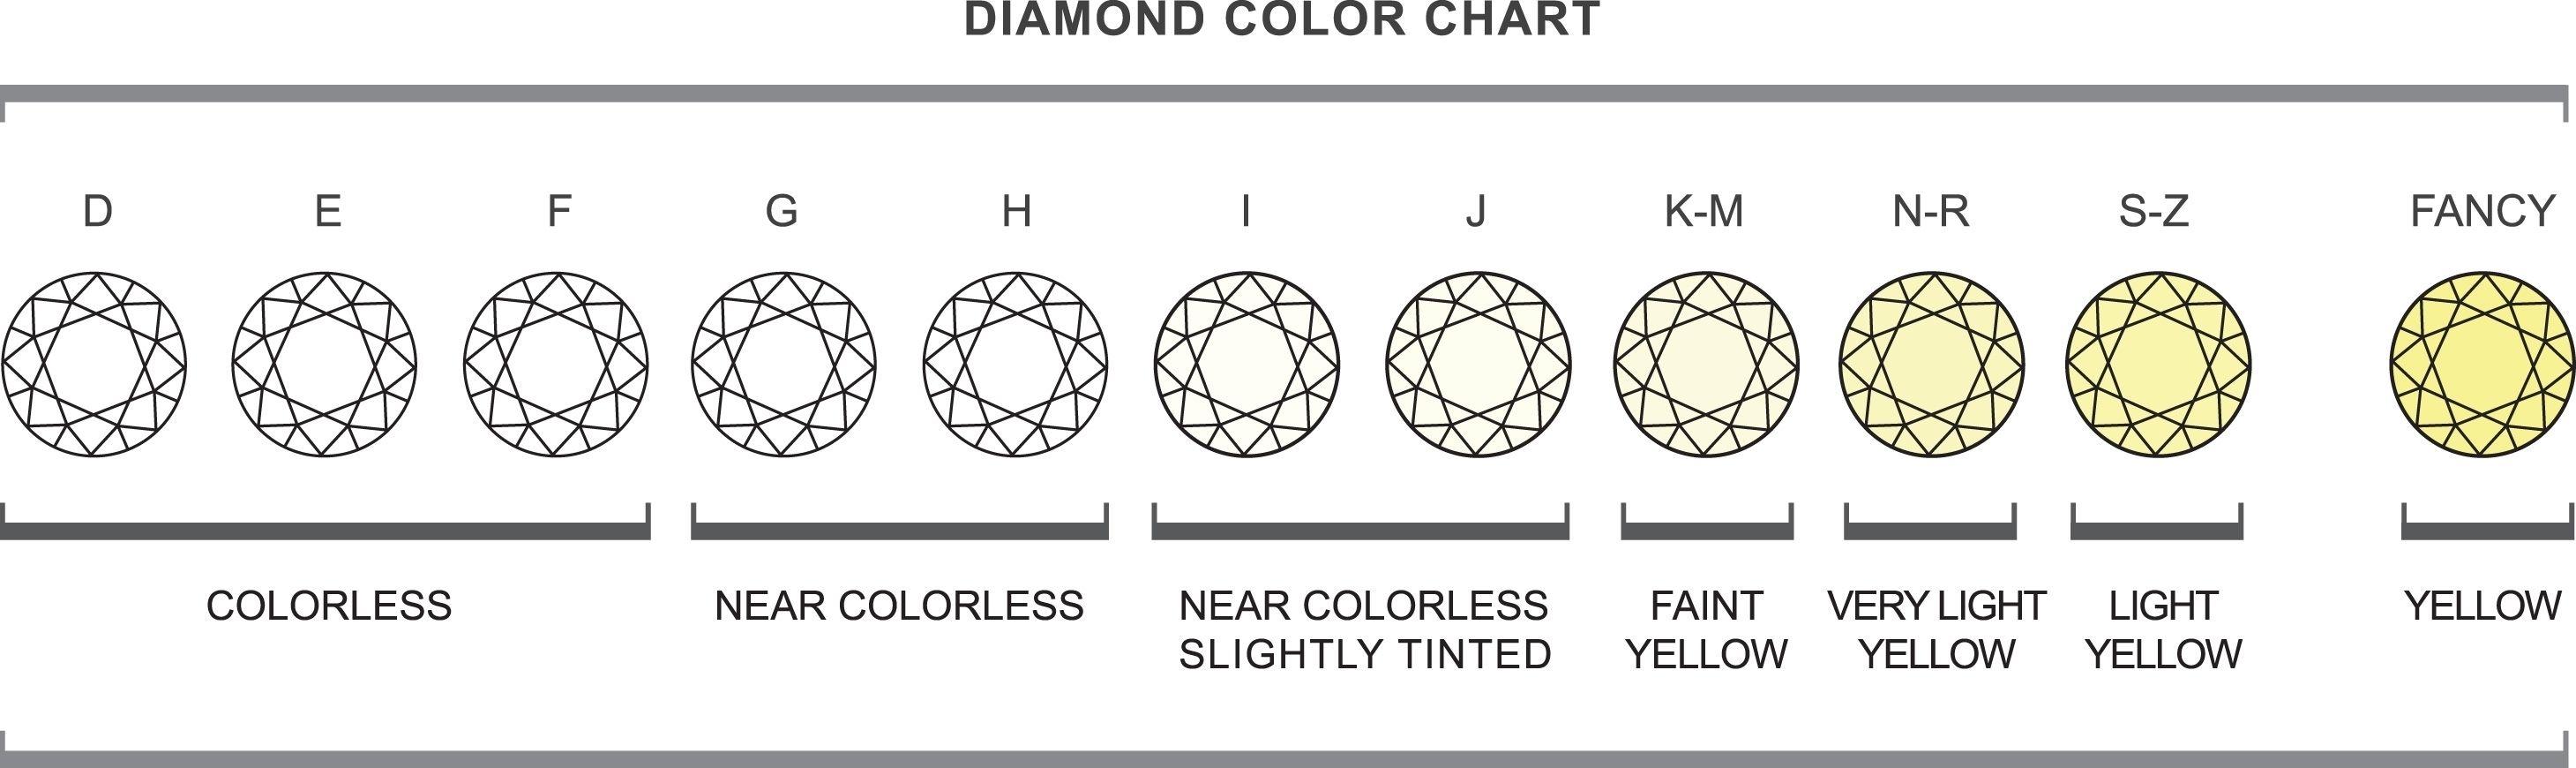 Diamond jewelry color chart ring pinterest colour chart diamond jewelry color chart nvjuhfo Gallery